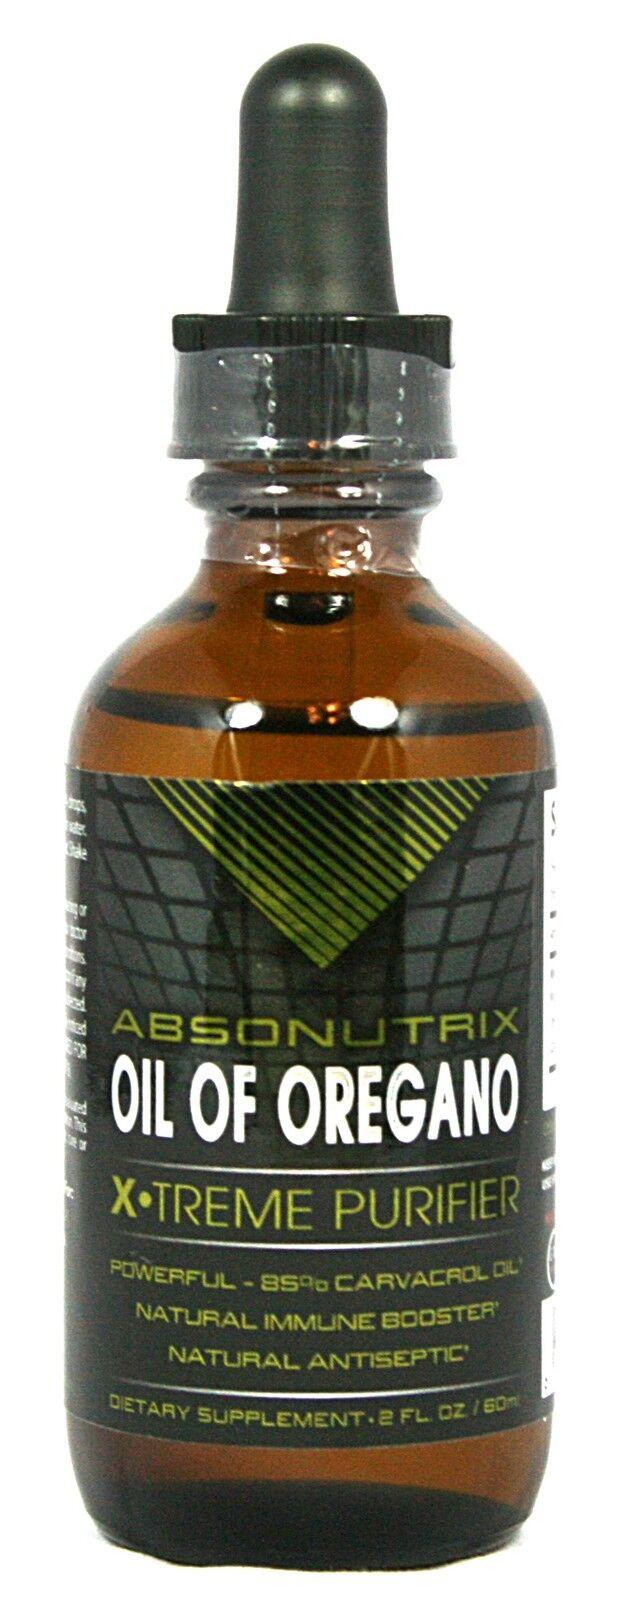 2 Bottles 2oz Oil Of Oregano 43mg Liquid Extract 85% Carv...